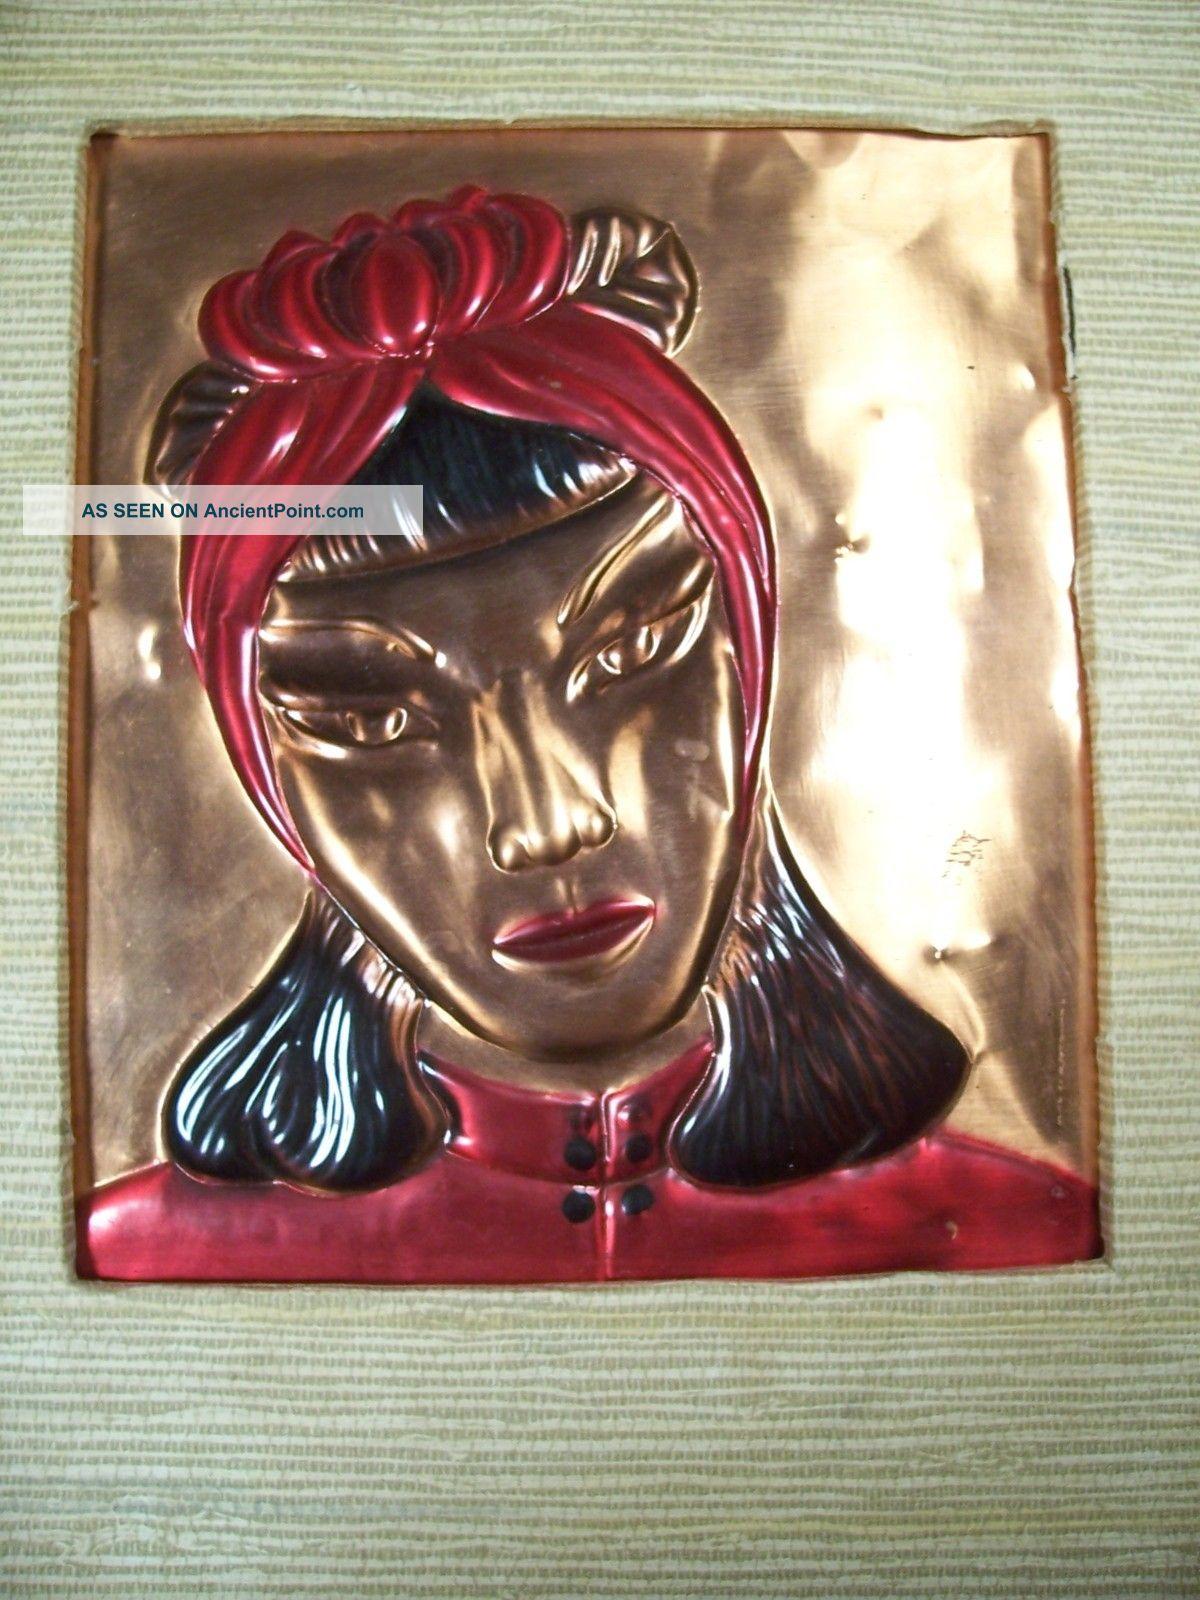 Vintage Wanda Irwin Art - Tooled Copper - Asian Woman - 12